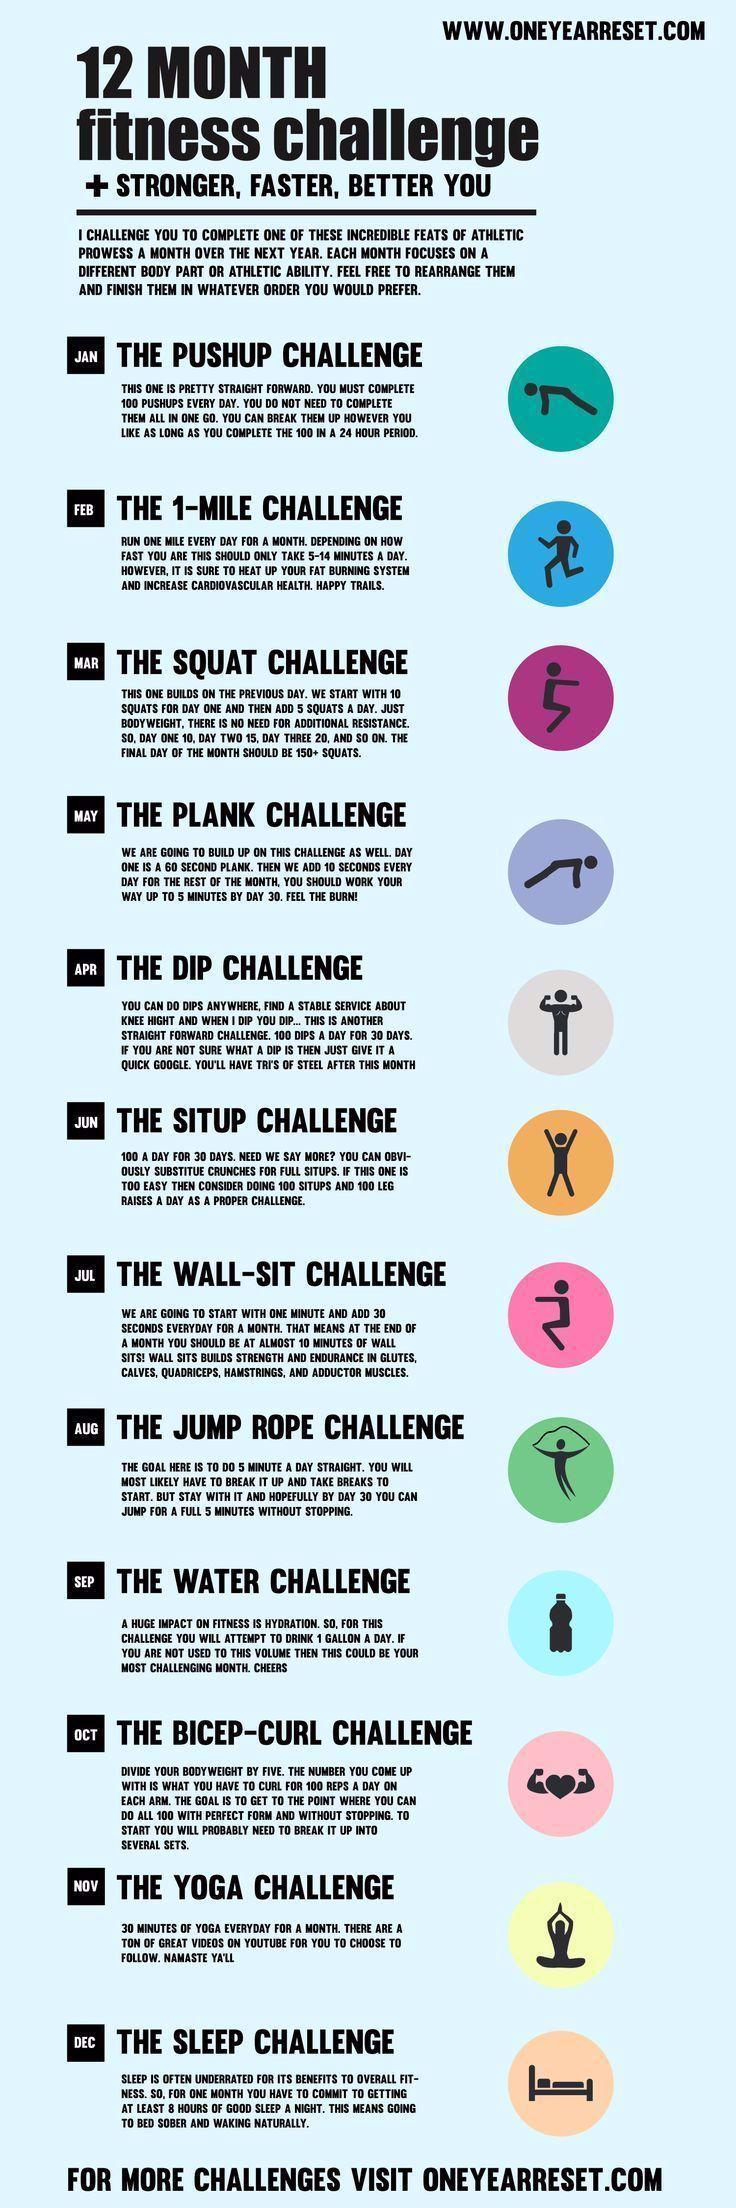 # Herausforderung #Tag #Fitness #Ideen #Monat #MonatlichFit - # Herausforderung #Tag #Fitness #Ideen...